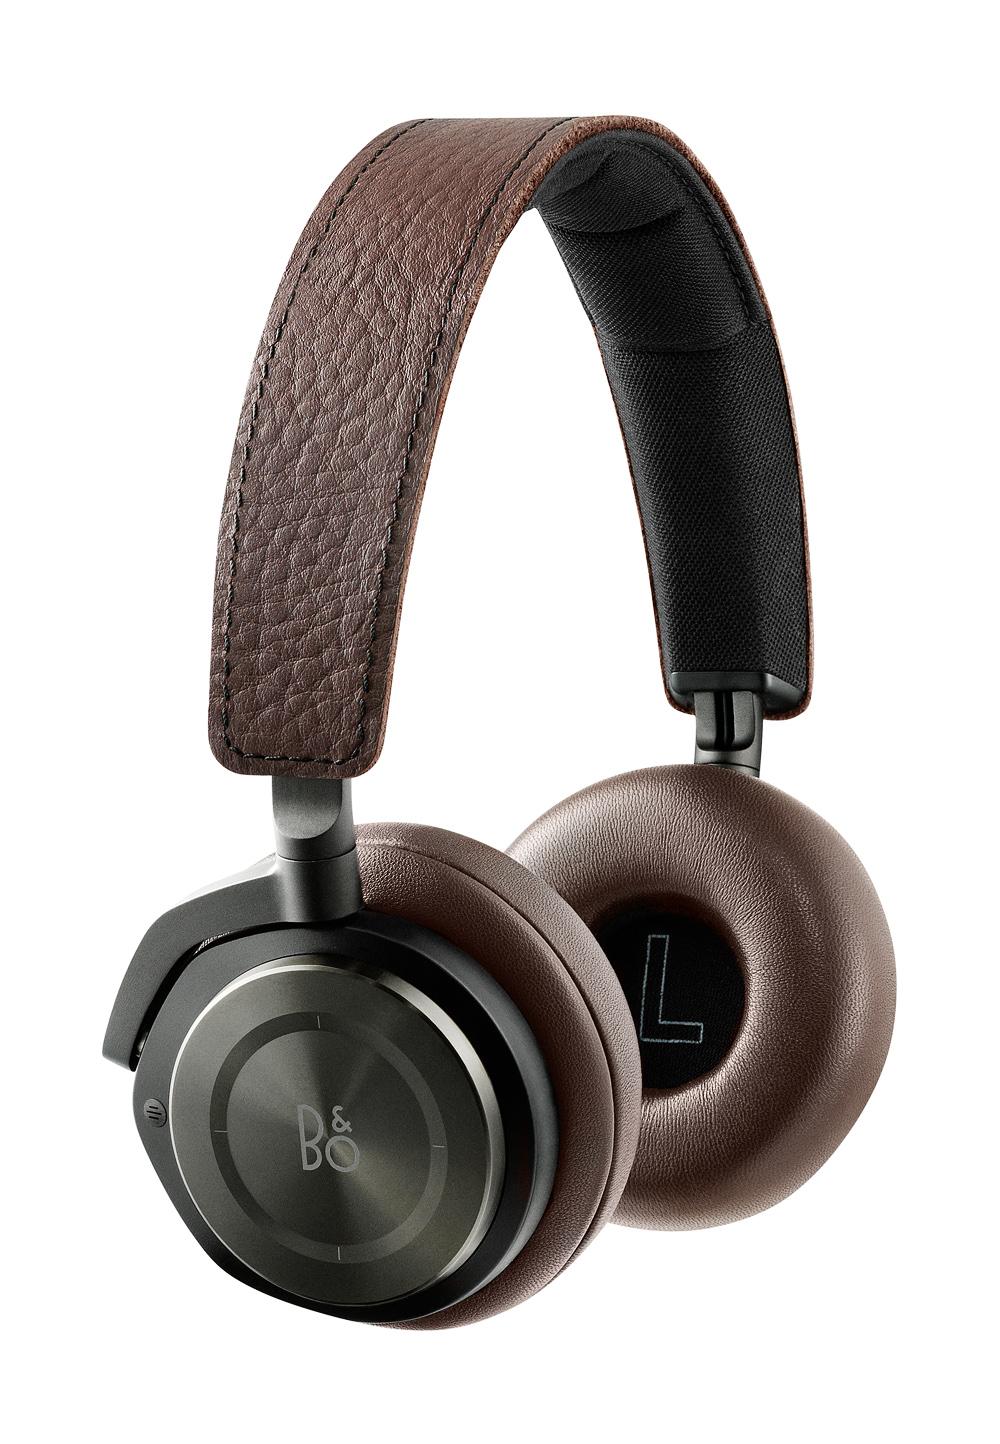 B&O PLAY Beoplay On-Ear Kopfhörer H8 in gray hazel und argillia bright